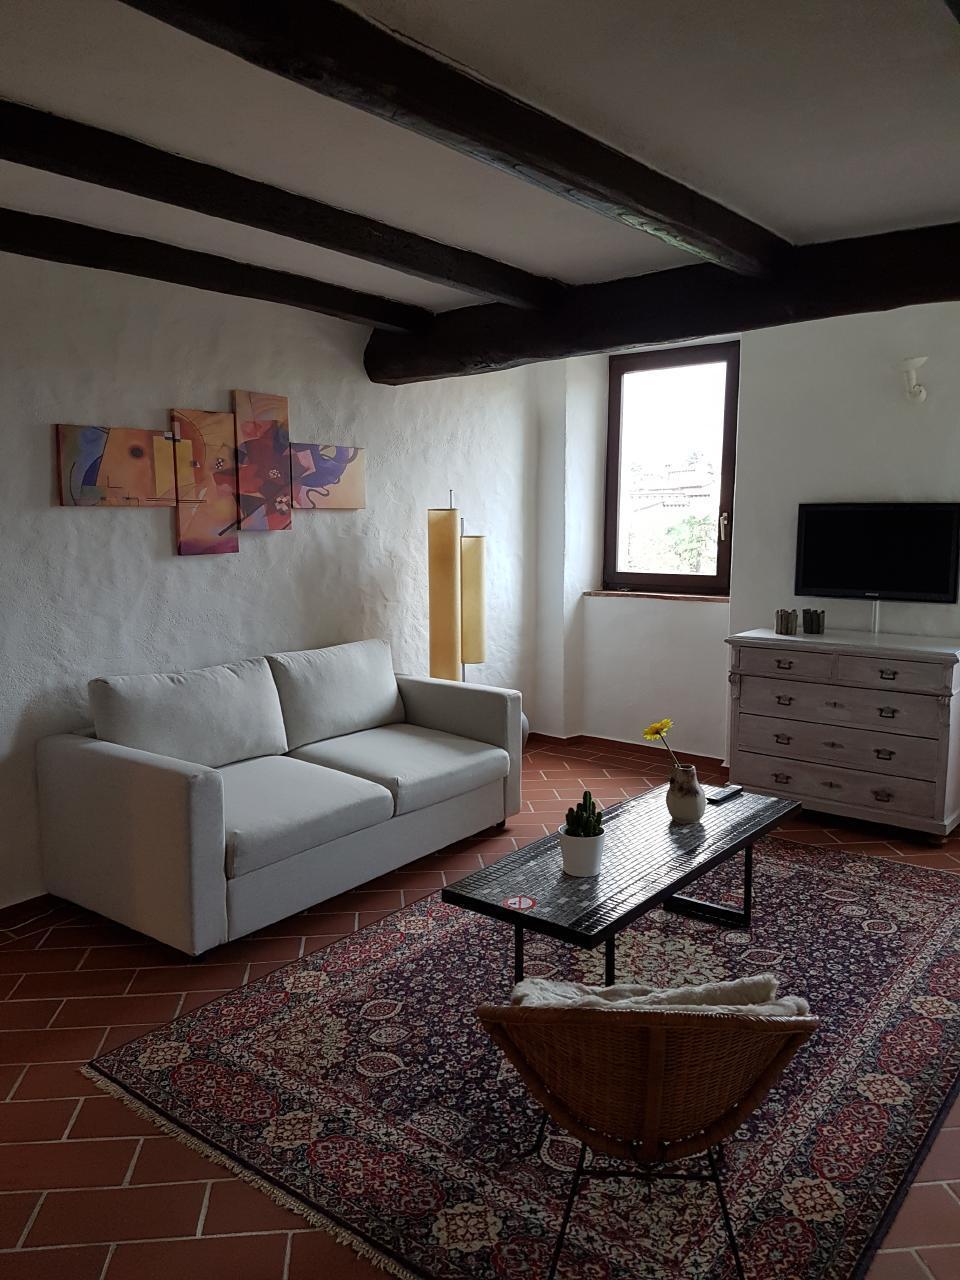 Ferienwohnung 2.5 Zi-Dachwohnung *Il rustico* mit viel Charme (2704083), Caslano, Lago di Lugano (CH), Tessin, Schweiz, Bild 1